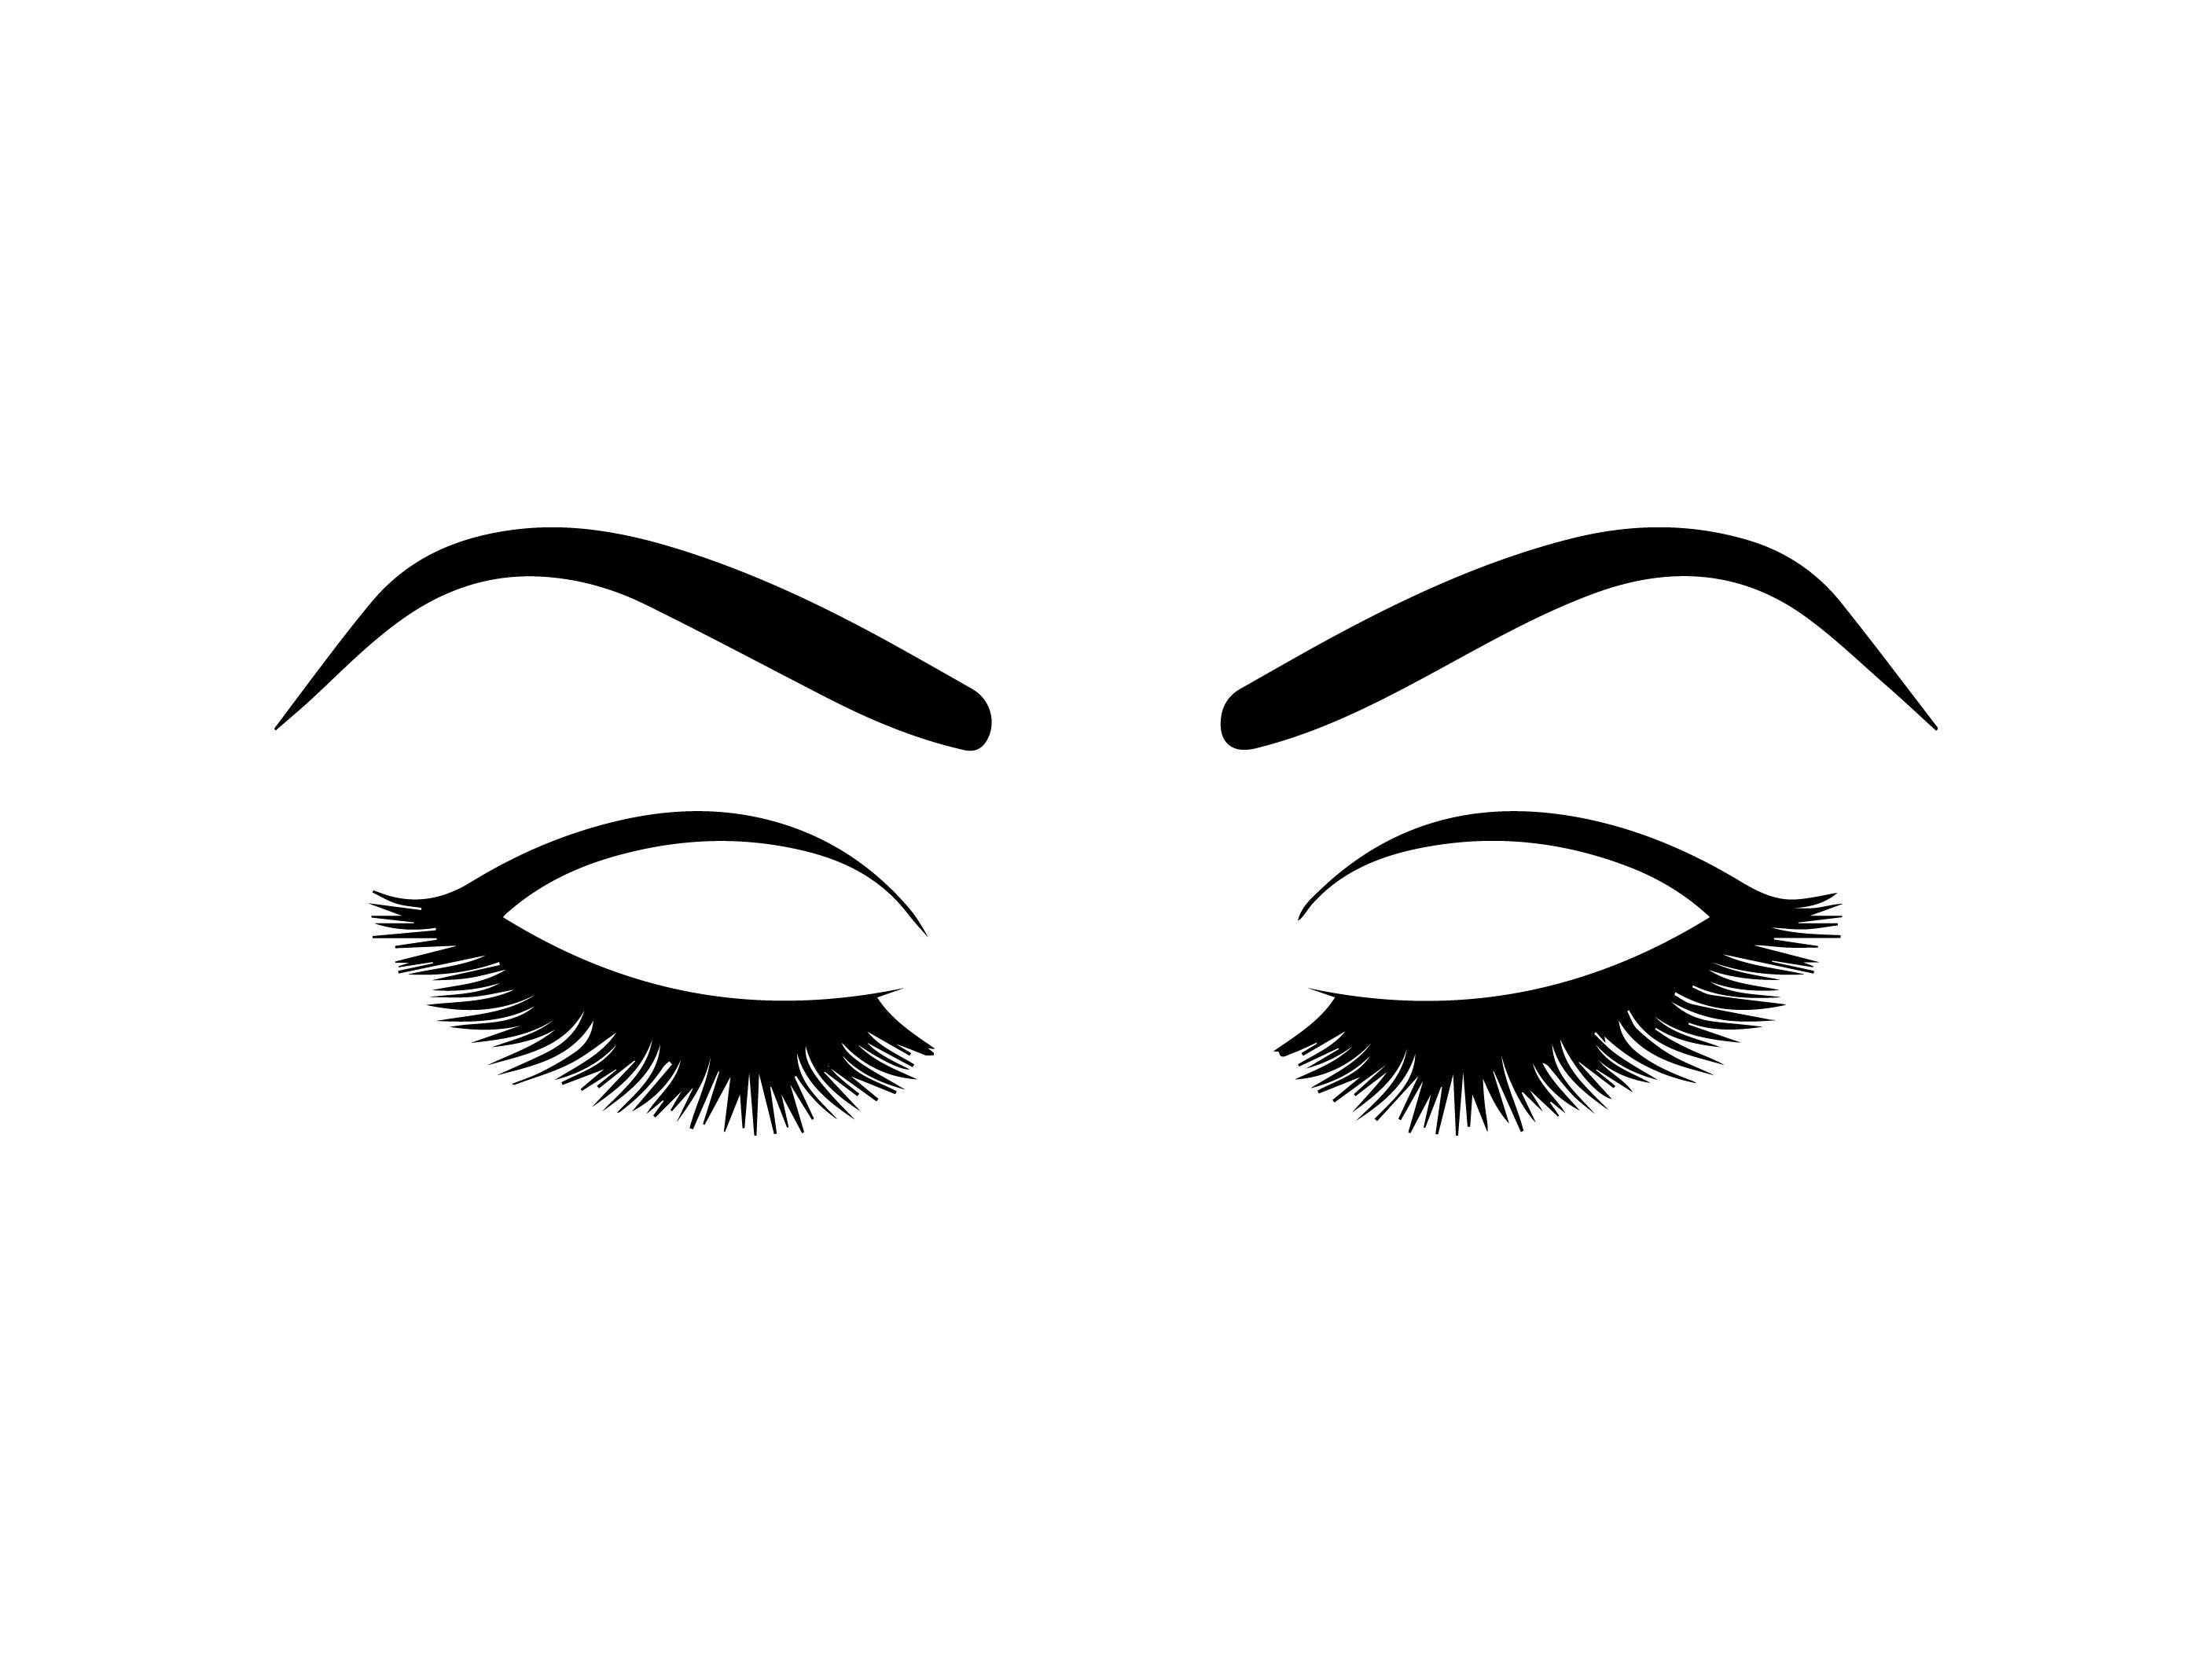 2814x2116 Eyebrow Eyelashes Vision Human Female Ojos Sign Eyeball See